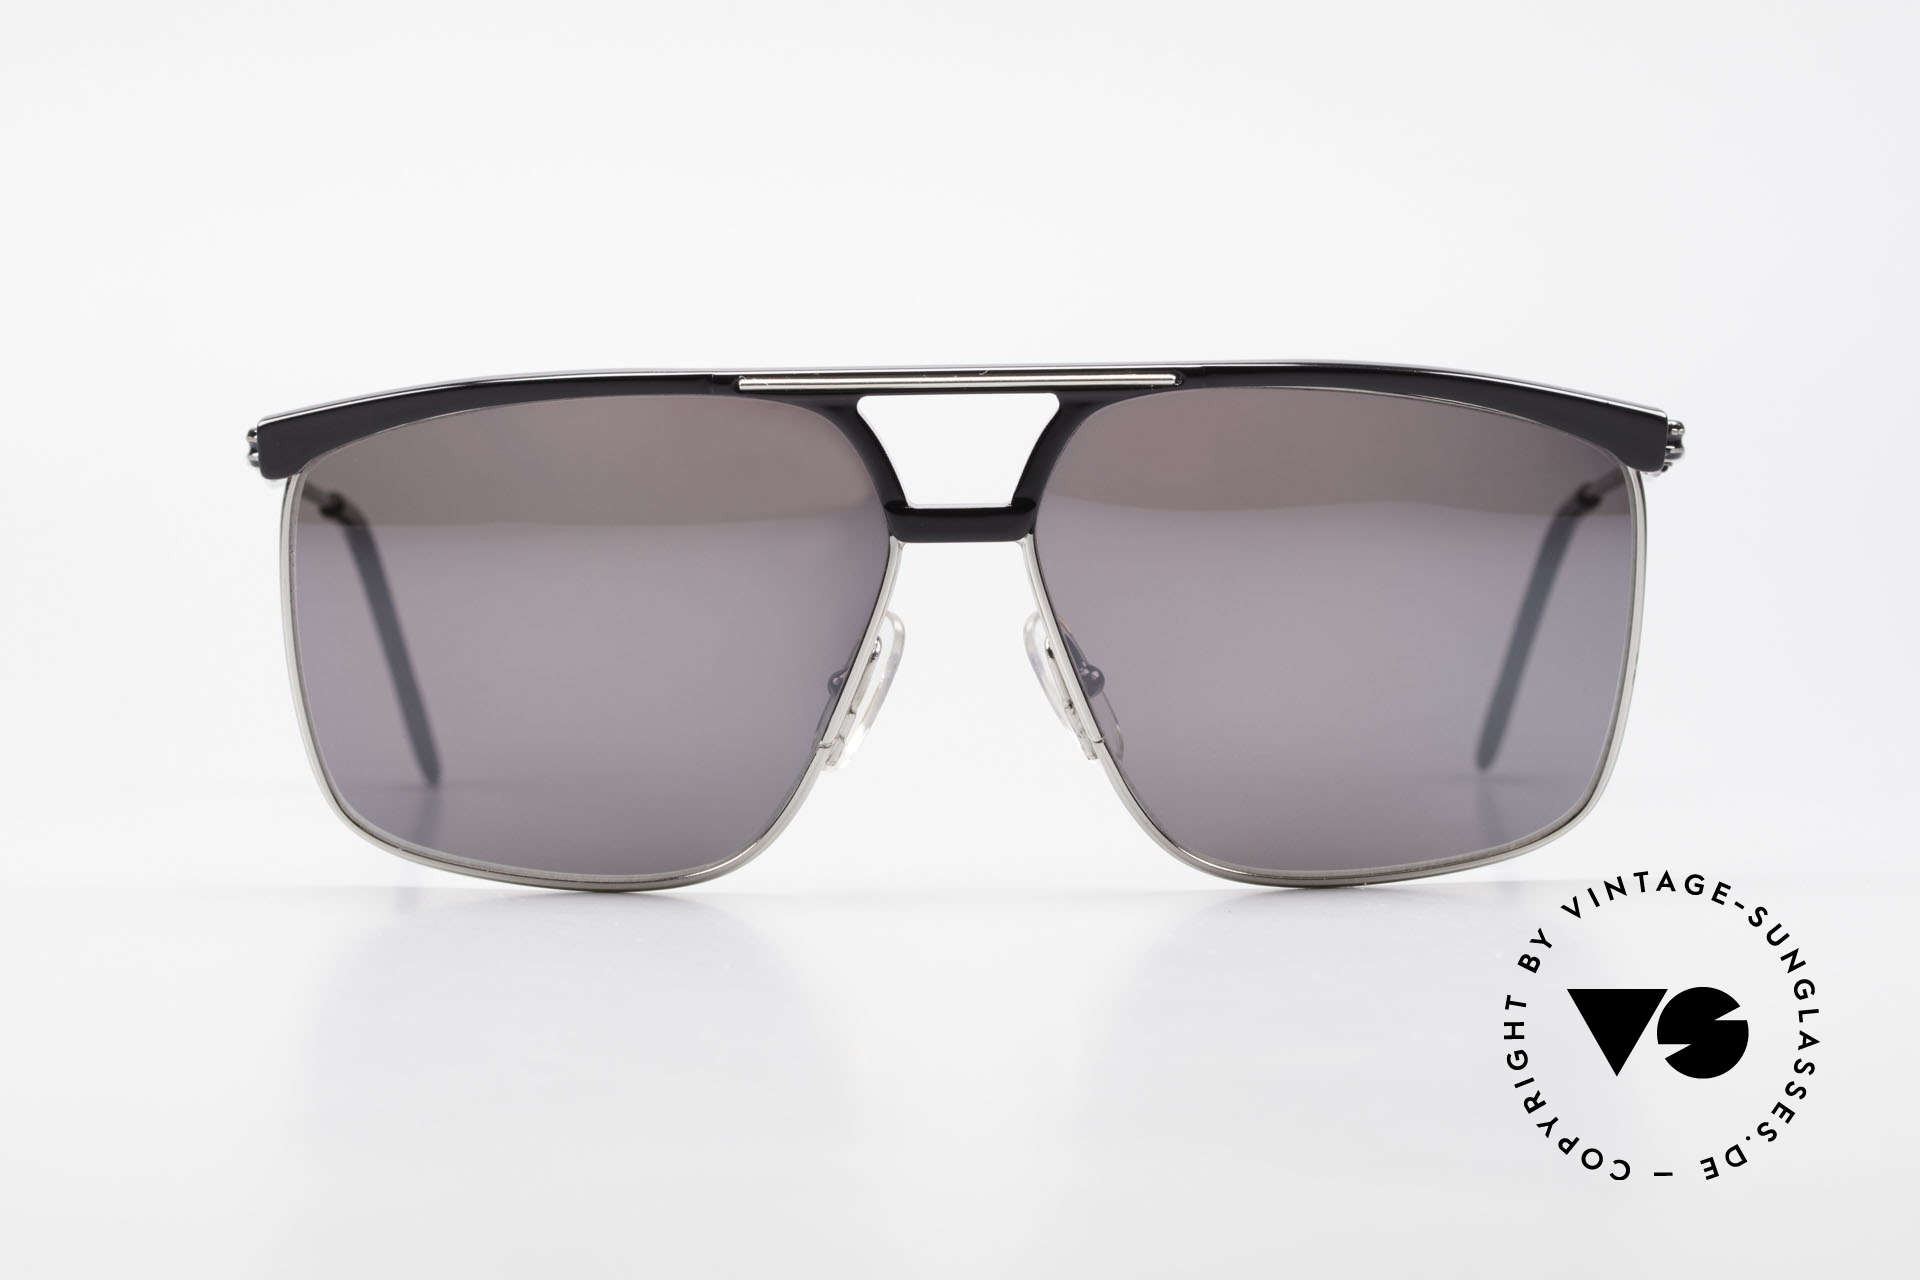 Ferrari F35 X-Large Mirrored Sunglasses, finest quality & superior frame finishing; true vintage, Made for Men